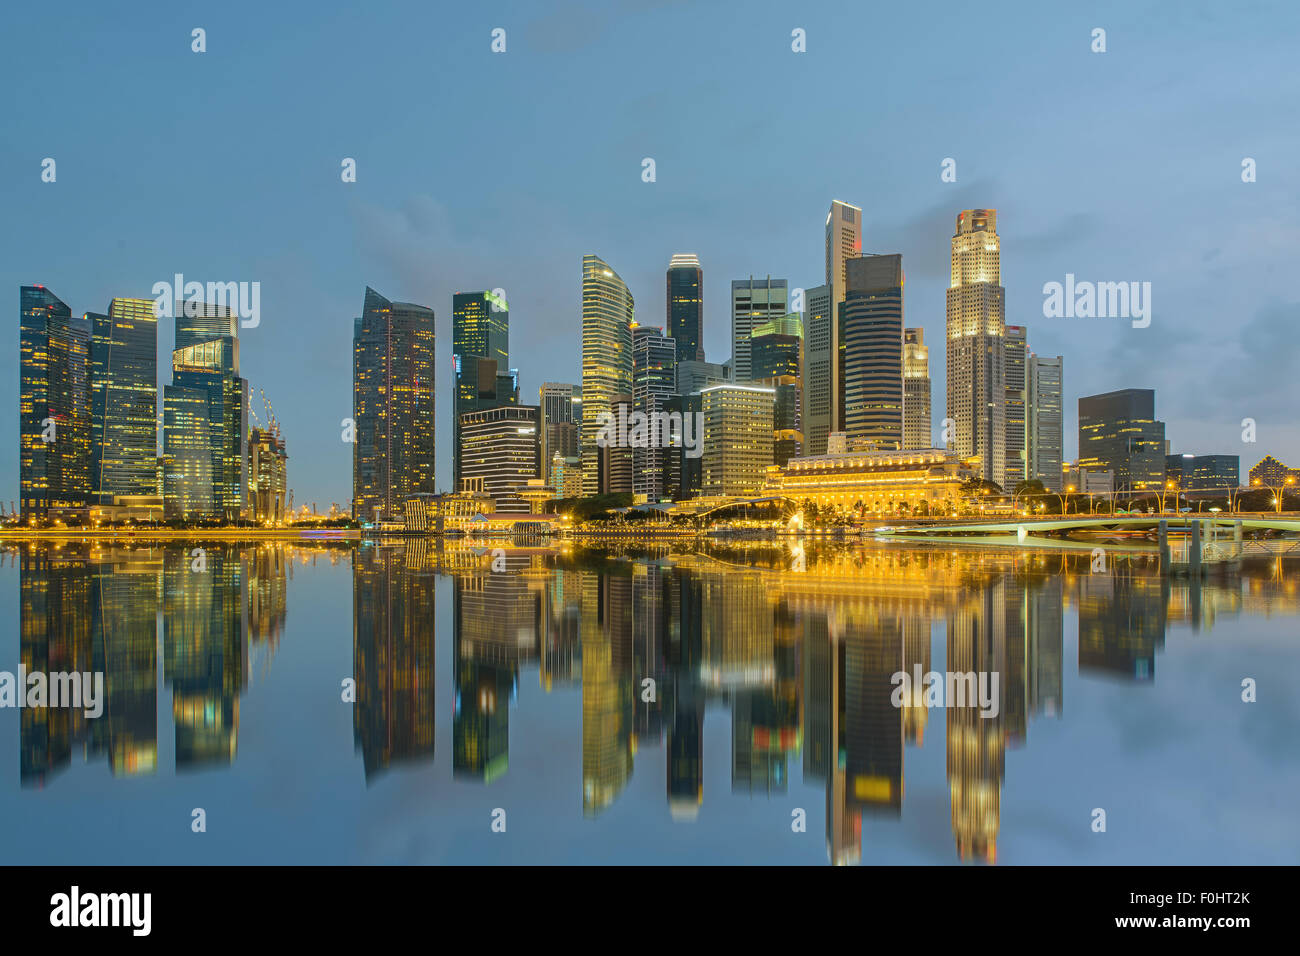 Singapur Stadt Skyline bei Nacht Stockbild